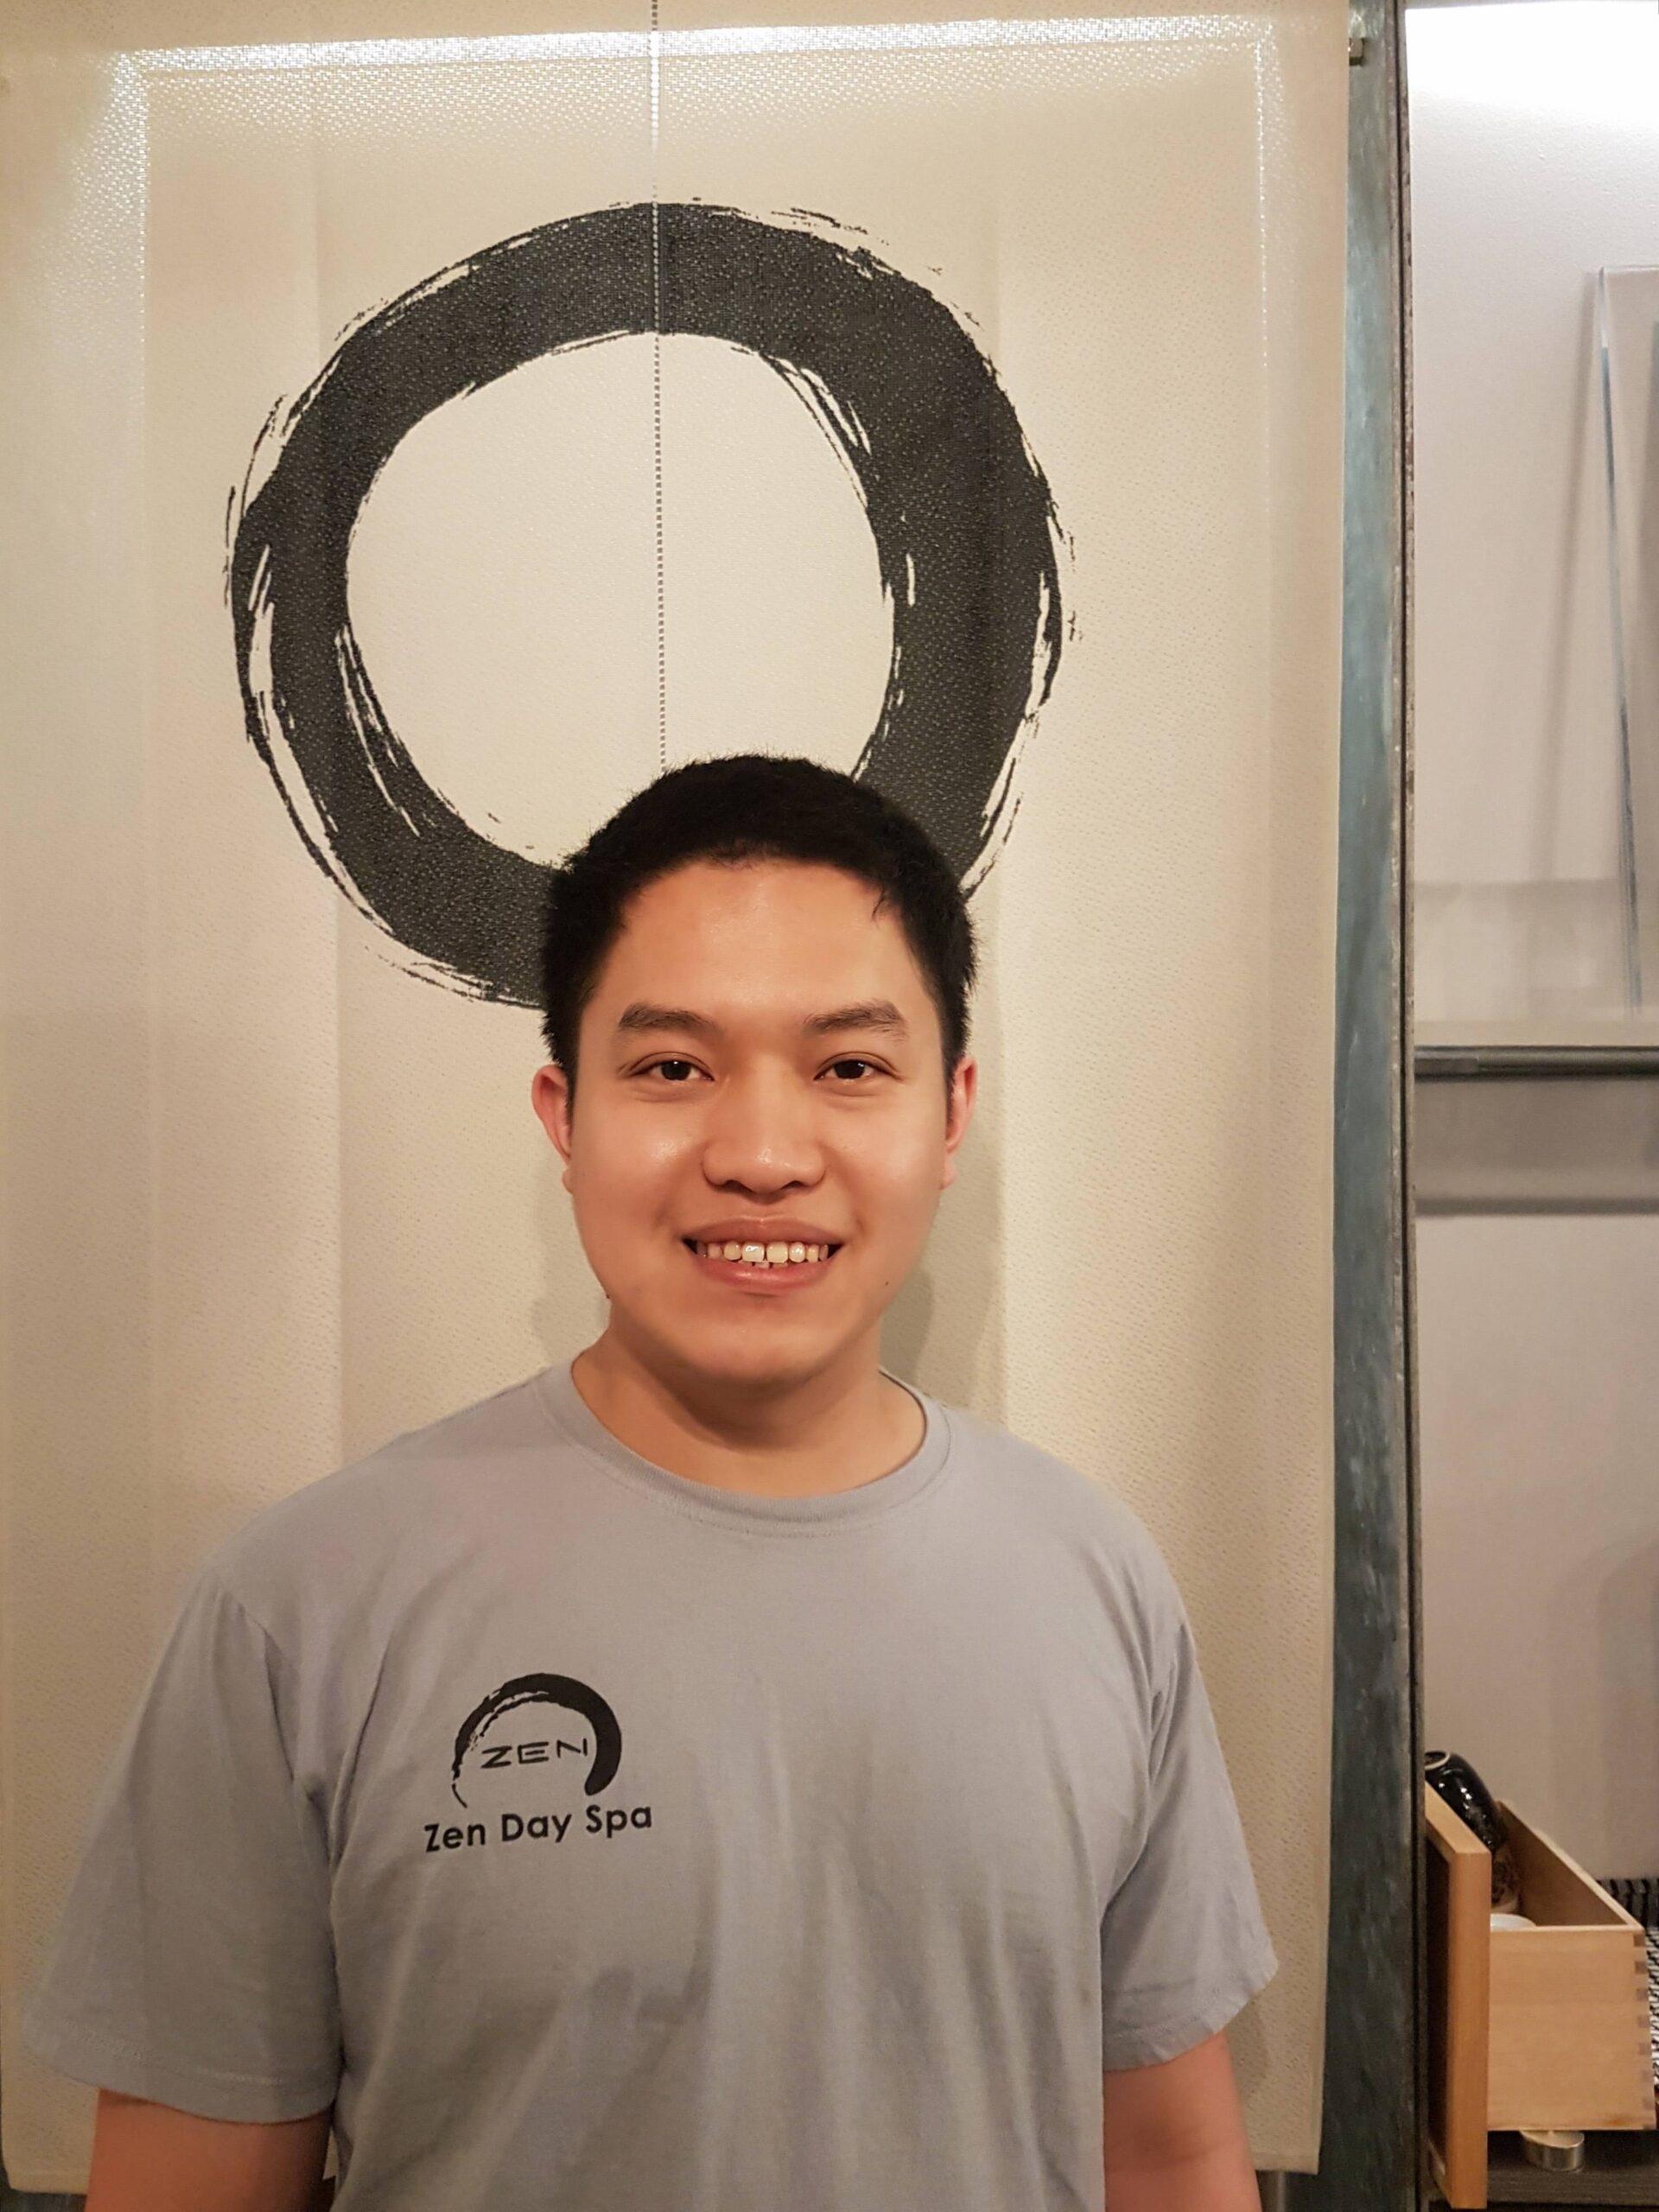 Male Massage Therapist - Erick - Zen Day Spa